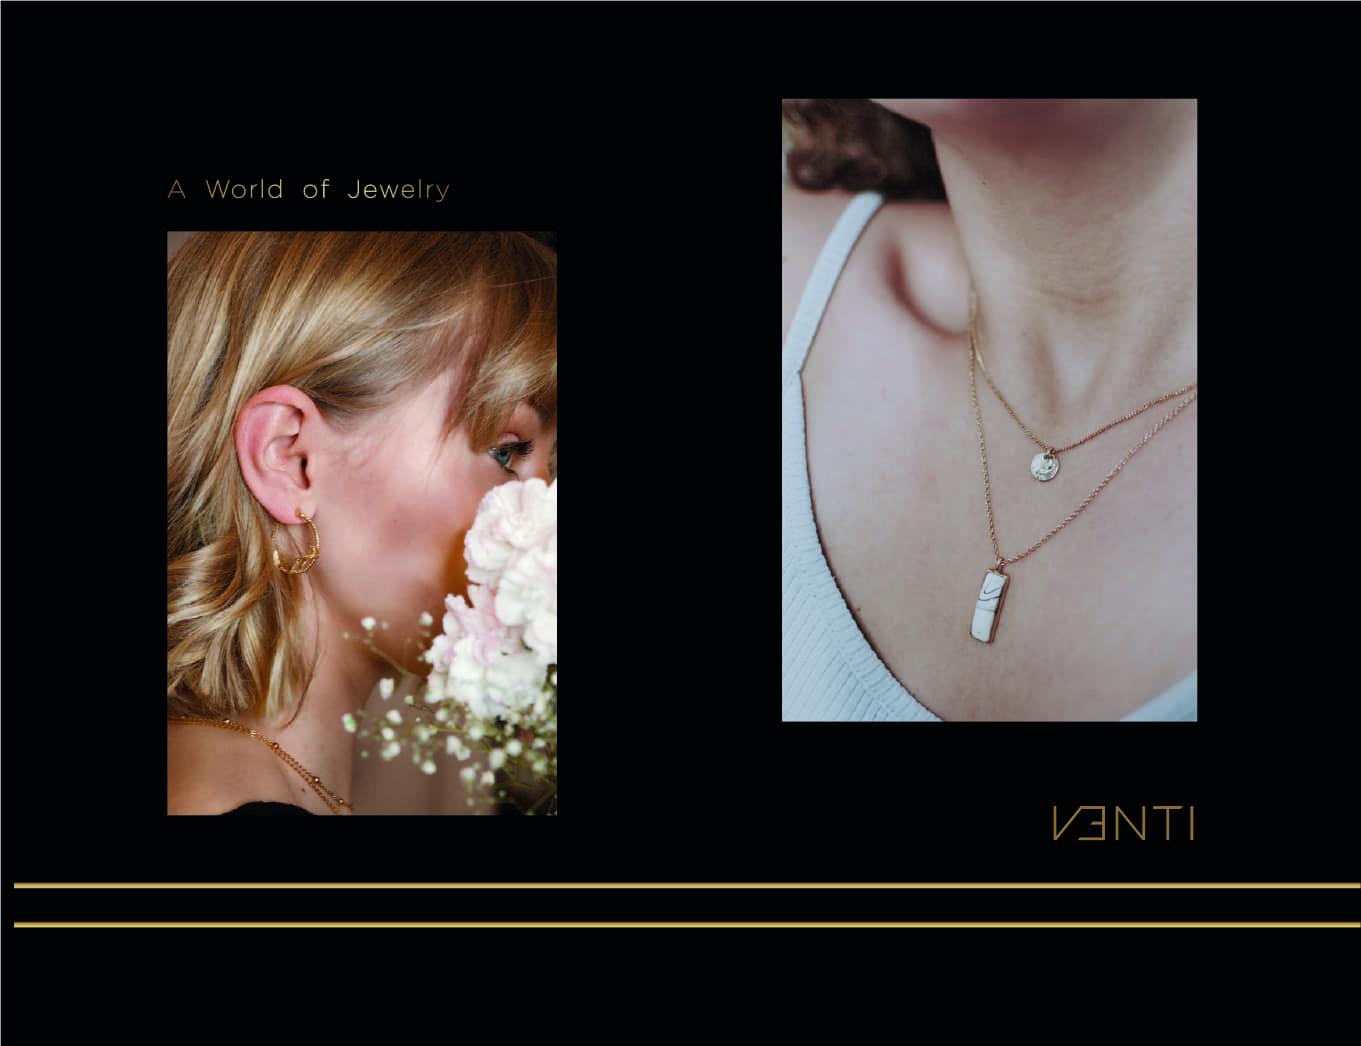 Model posing with Venti premium women jewellery luxury neckless